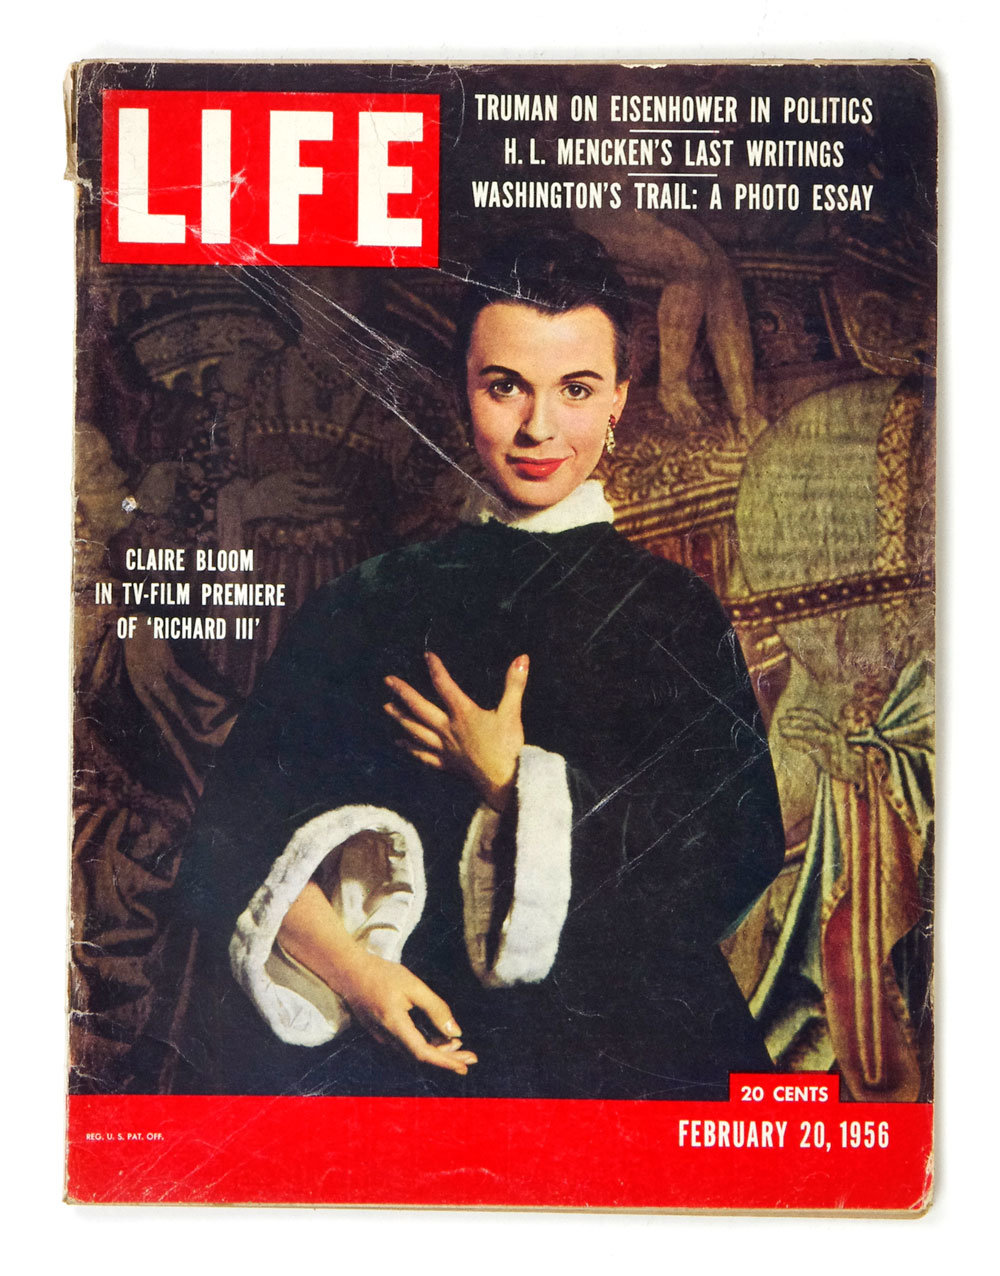 LIFE Magazine 1956 February 20 Claire Bloom